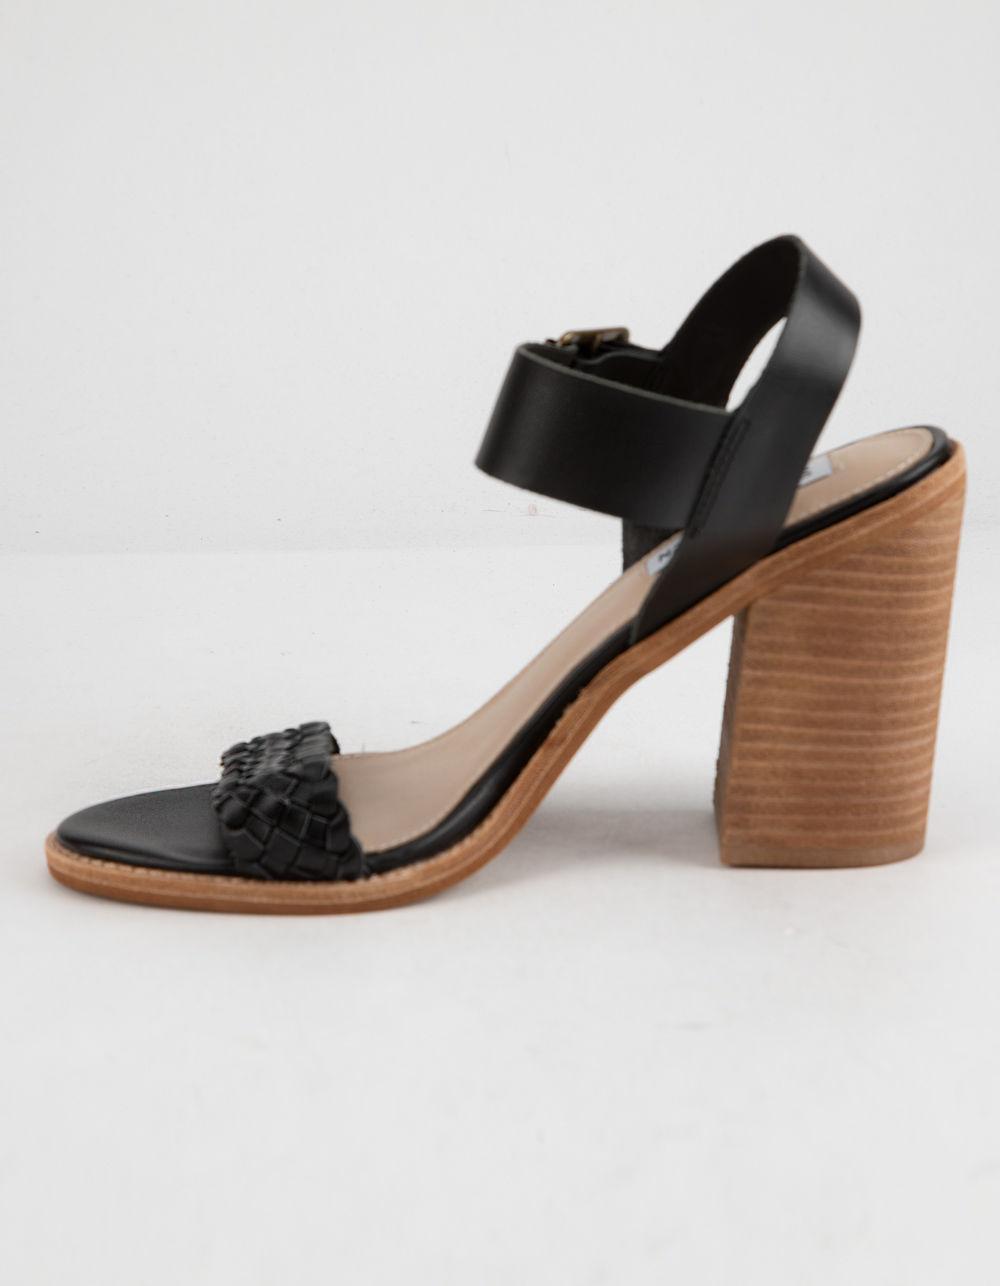 5234ee22105 Steve Madden - Cadence Black Leather Womens Heeled Sandals - Lyst. View  fullscreen